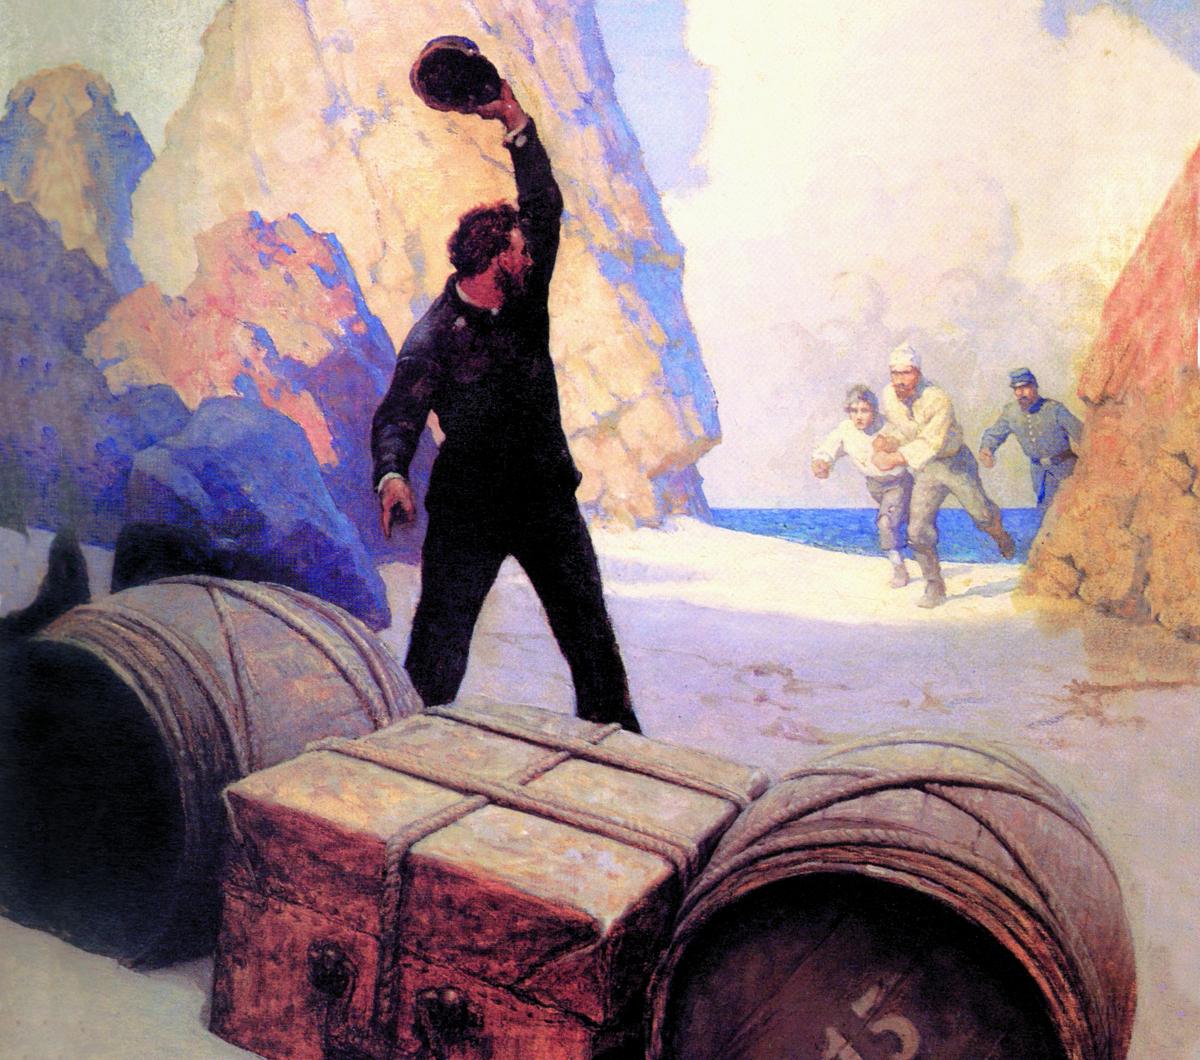 Painting displays men running toward treasure on a beach